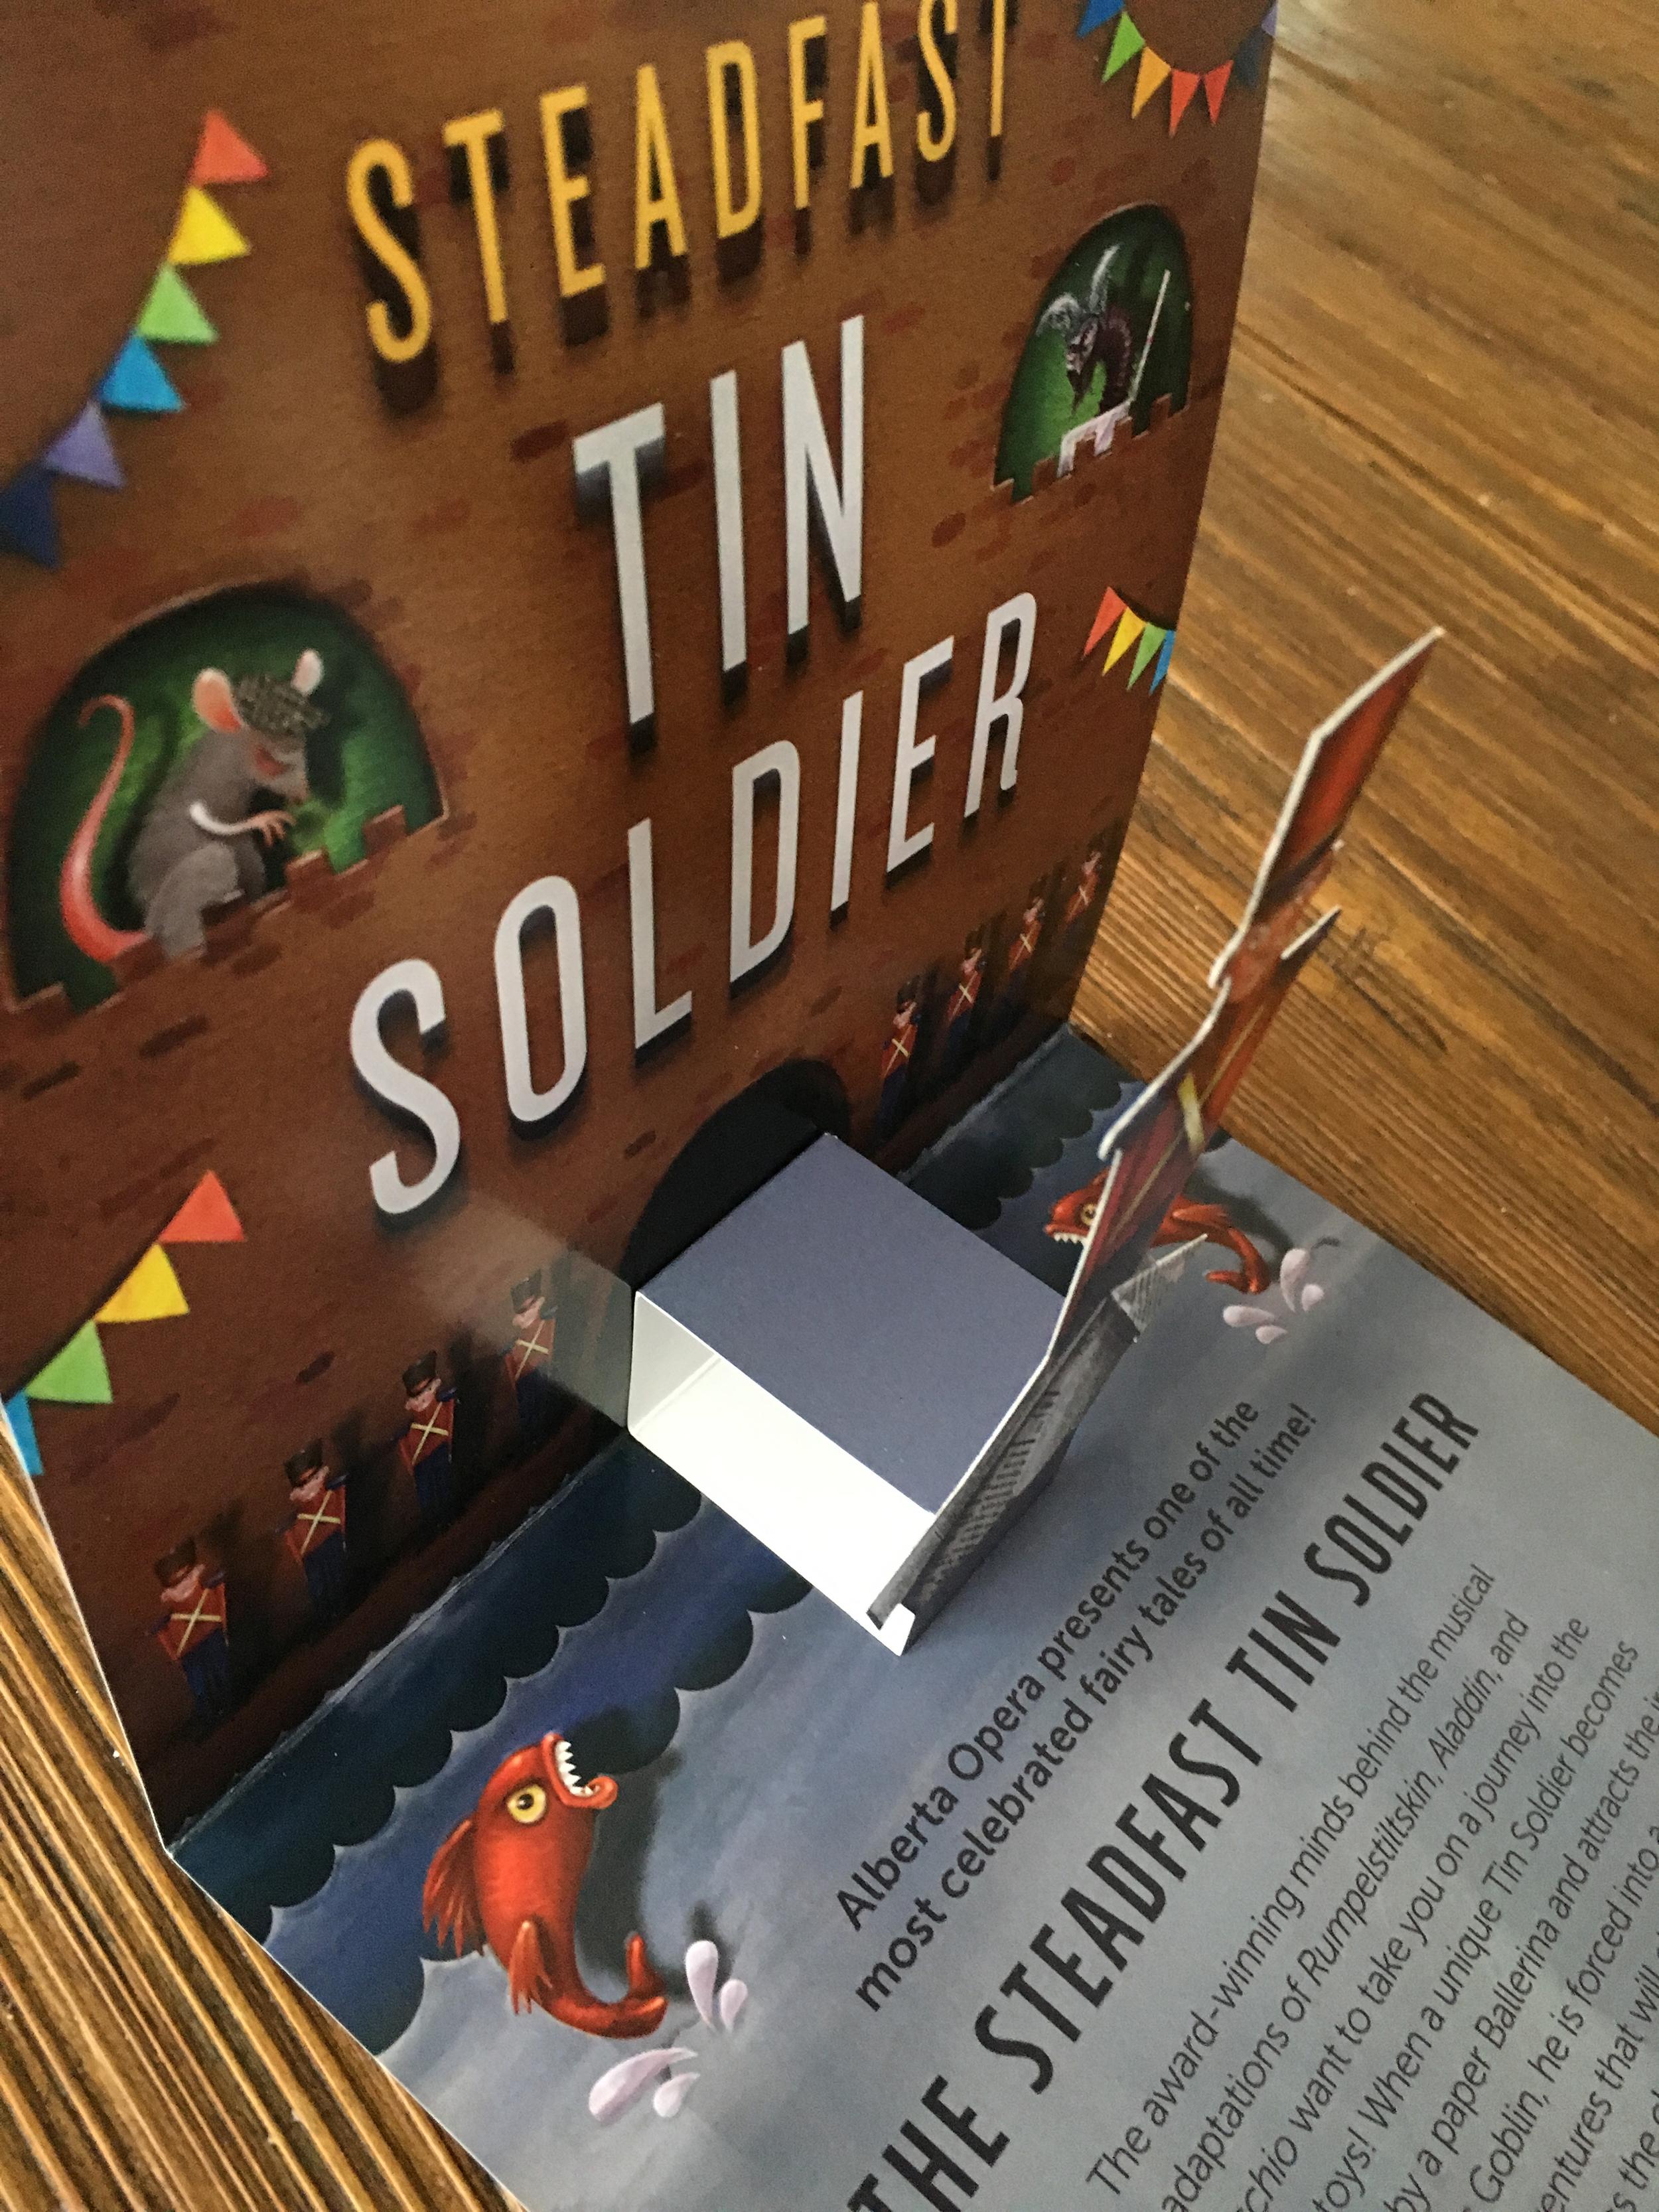 steadfast-tin-solder_8-fold-details.jpg